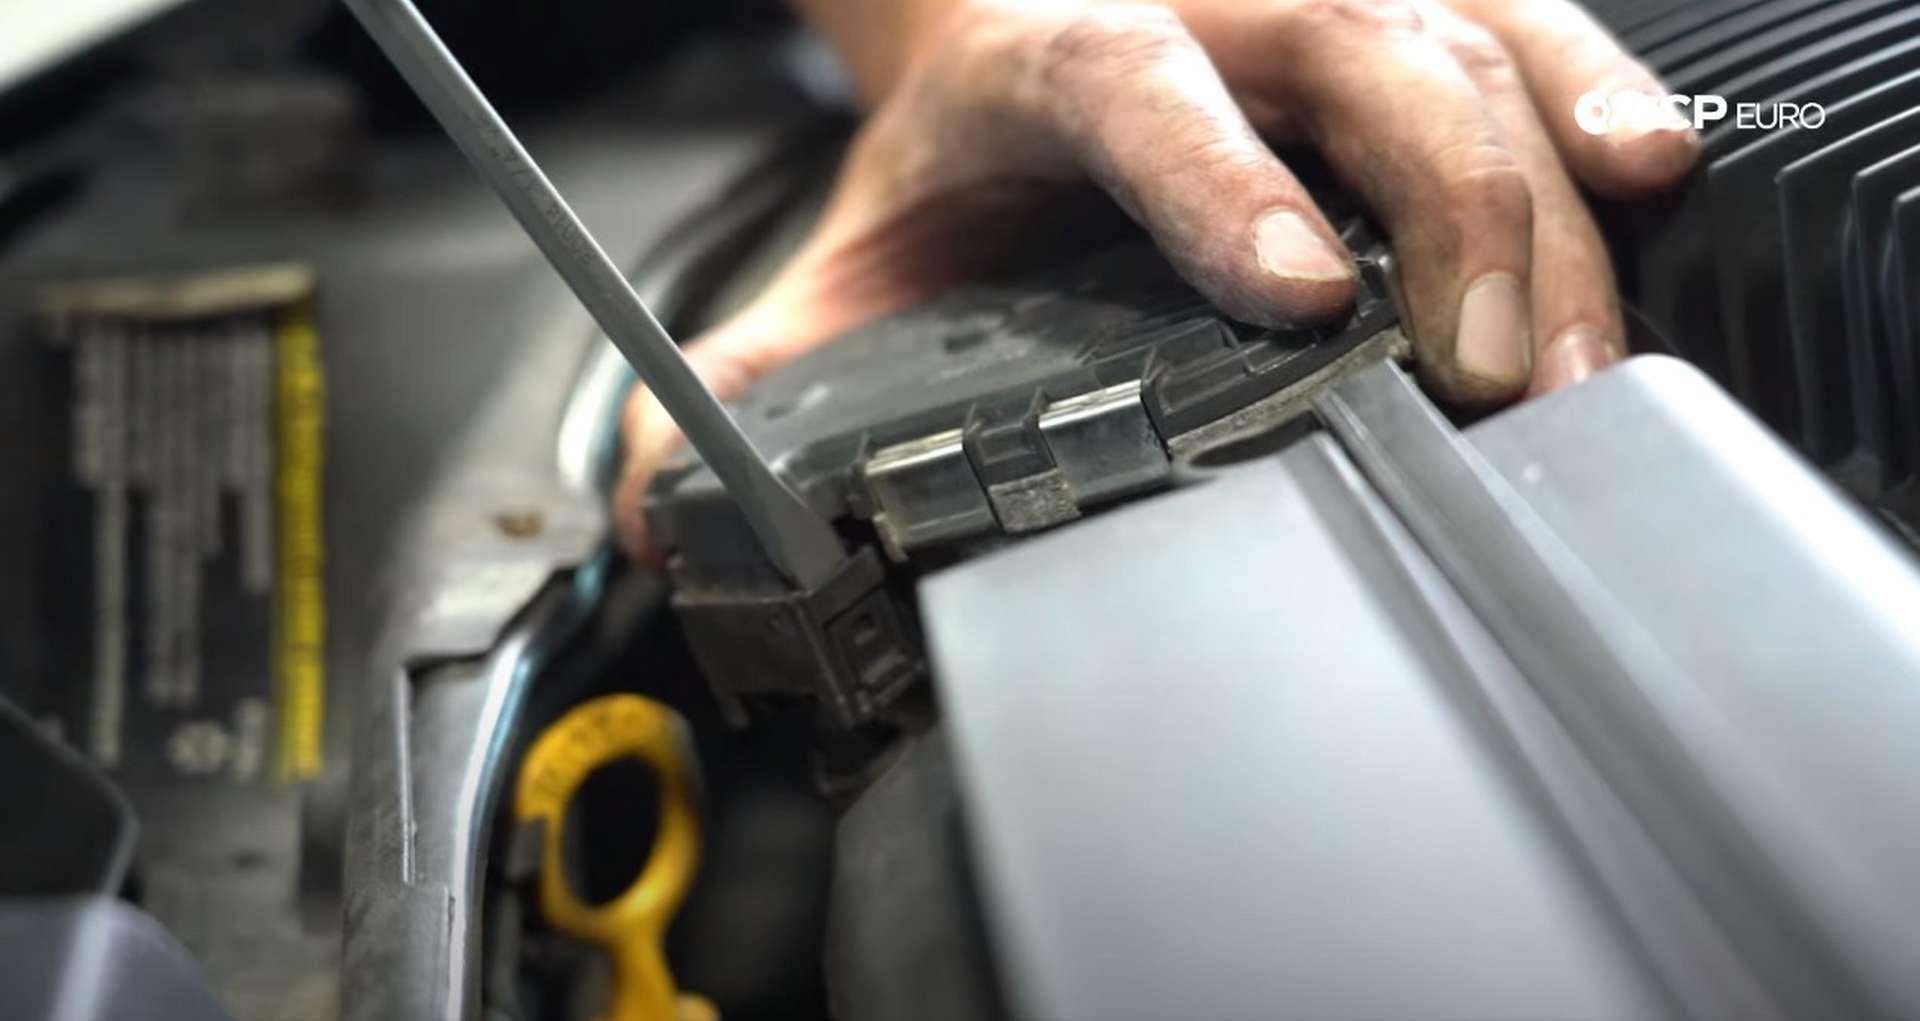 DIY Volvo Alternator and Serpentine Belt Replacement removing the throttle body plug